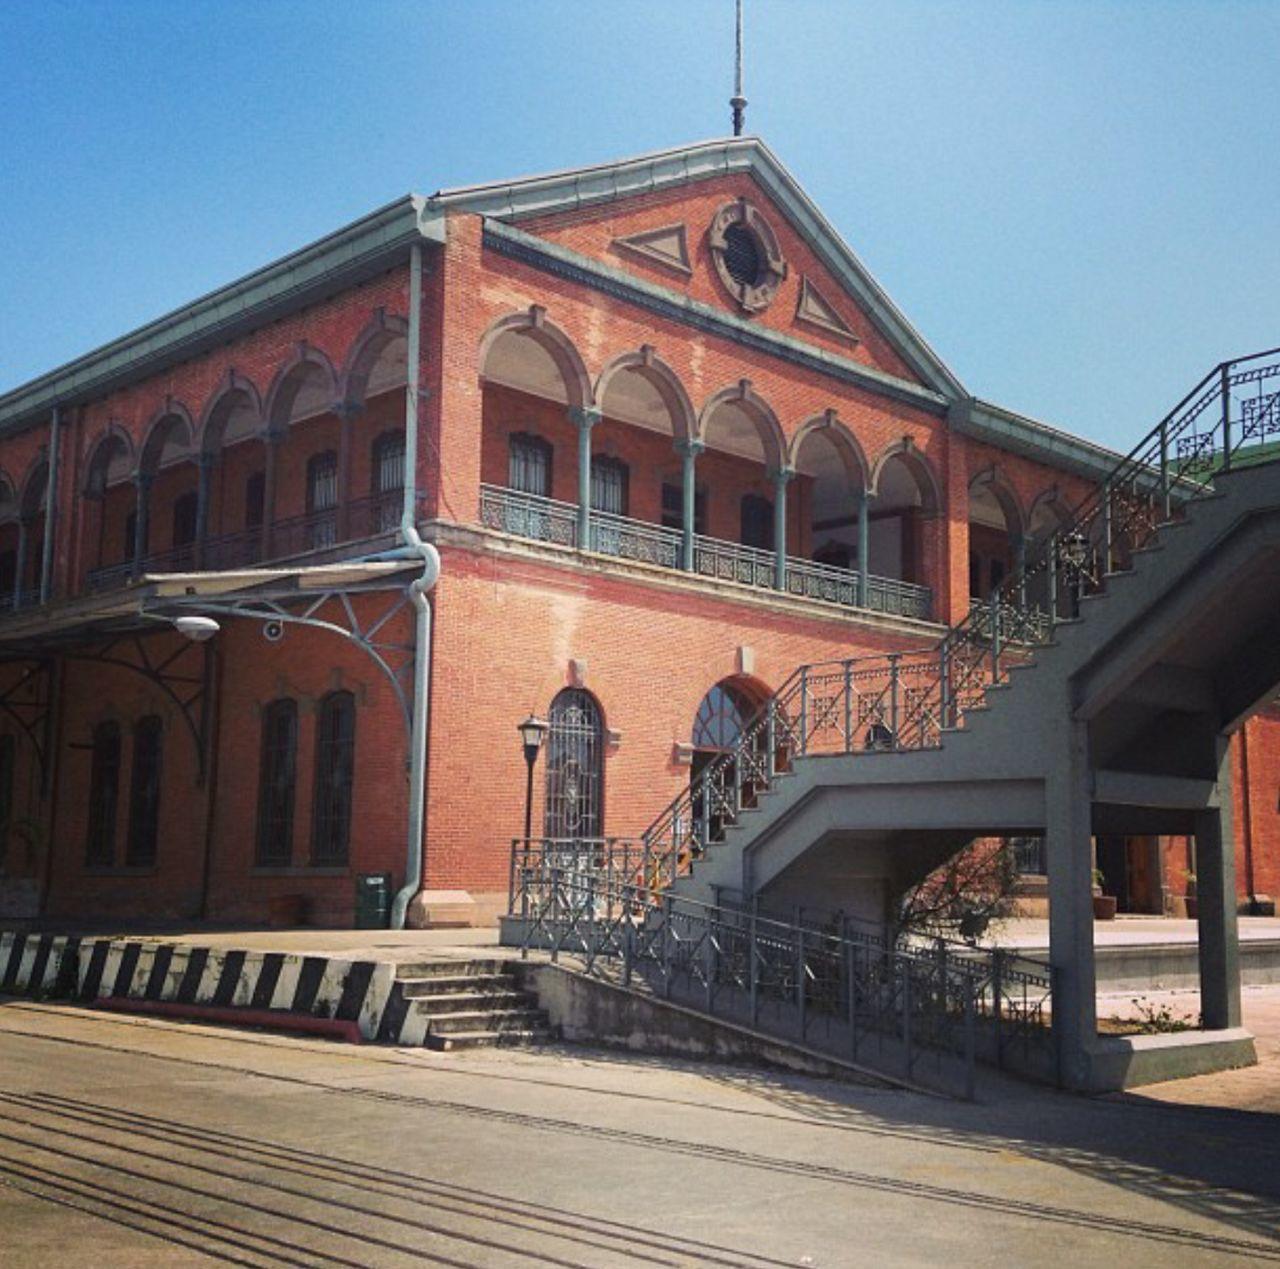 City Architecture No People Travel Destinations Tampico Tamaulipas Mexico Railroad Track Port